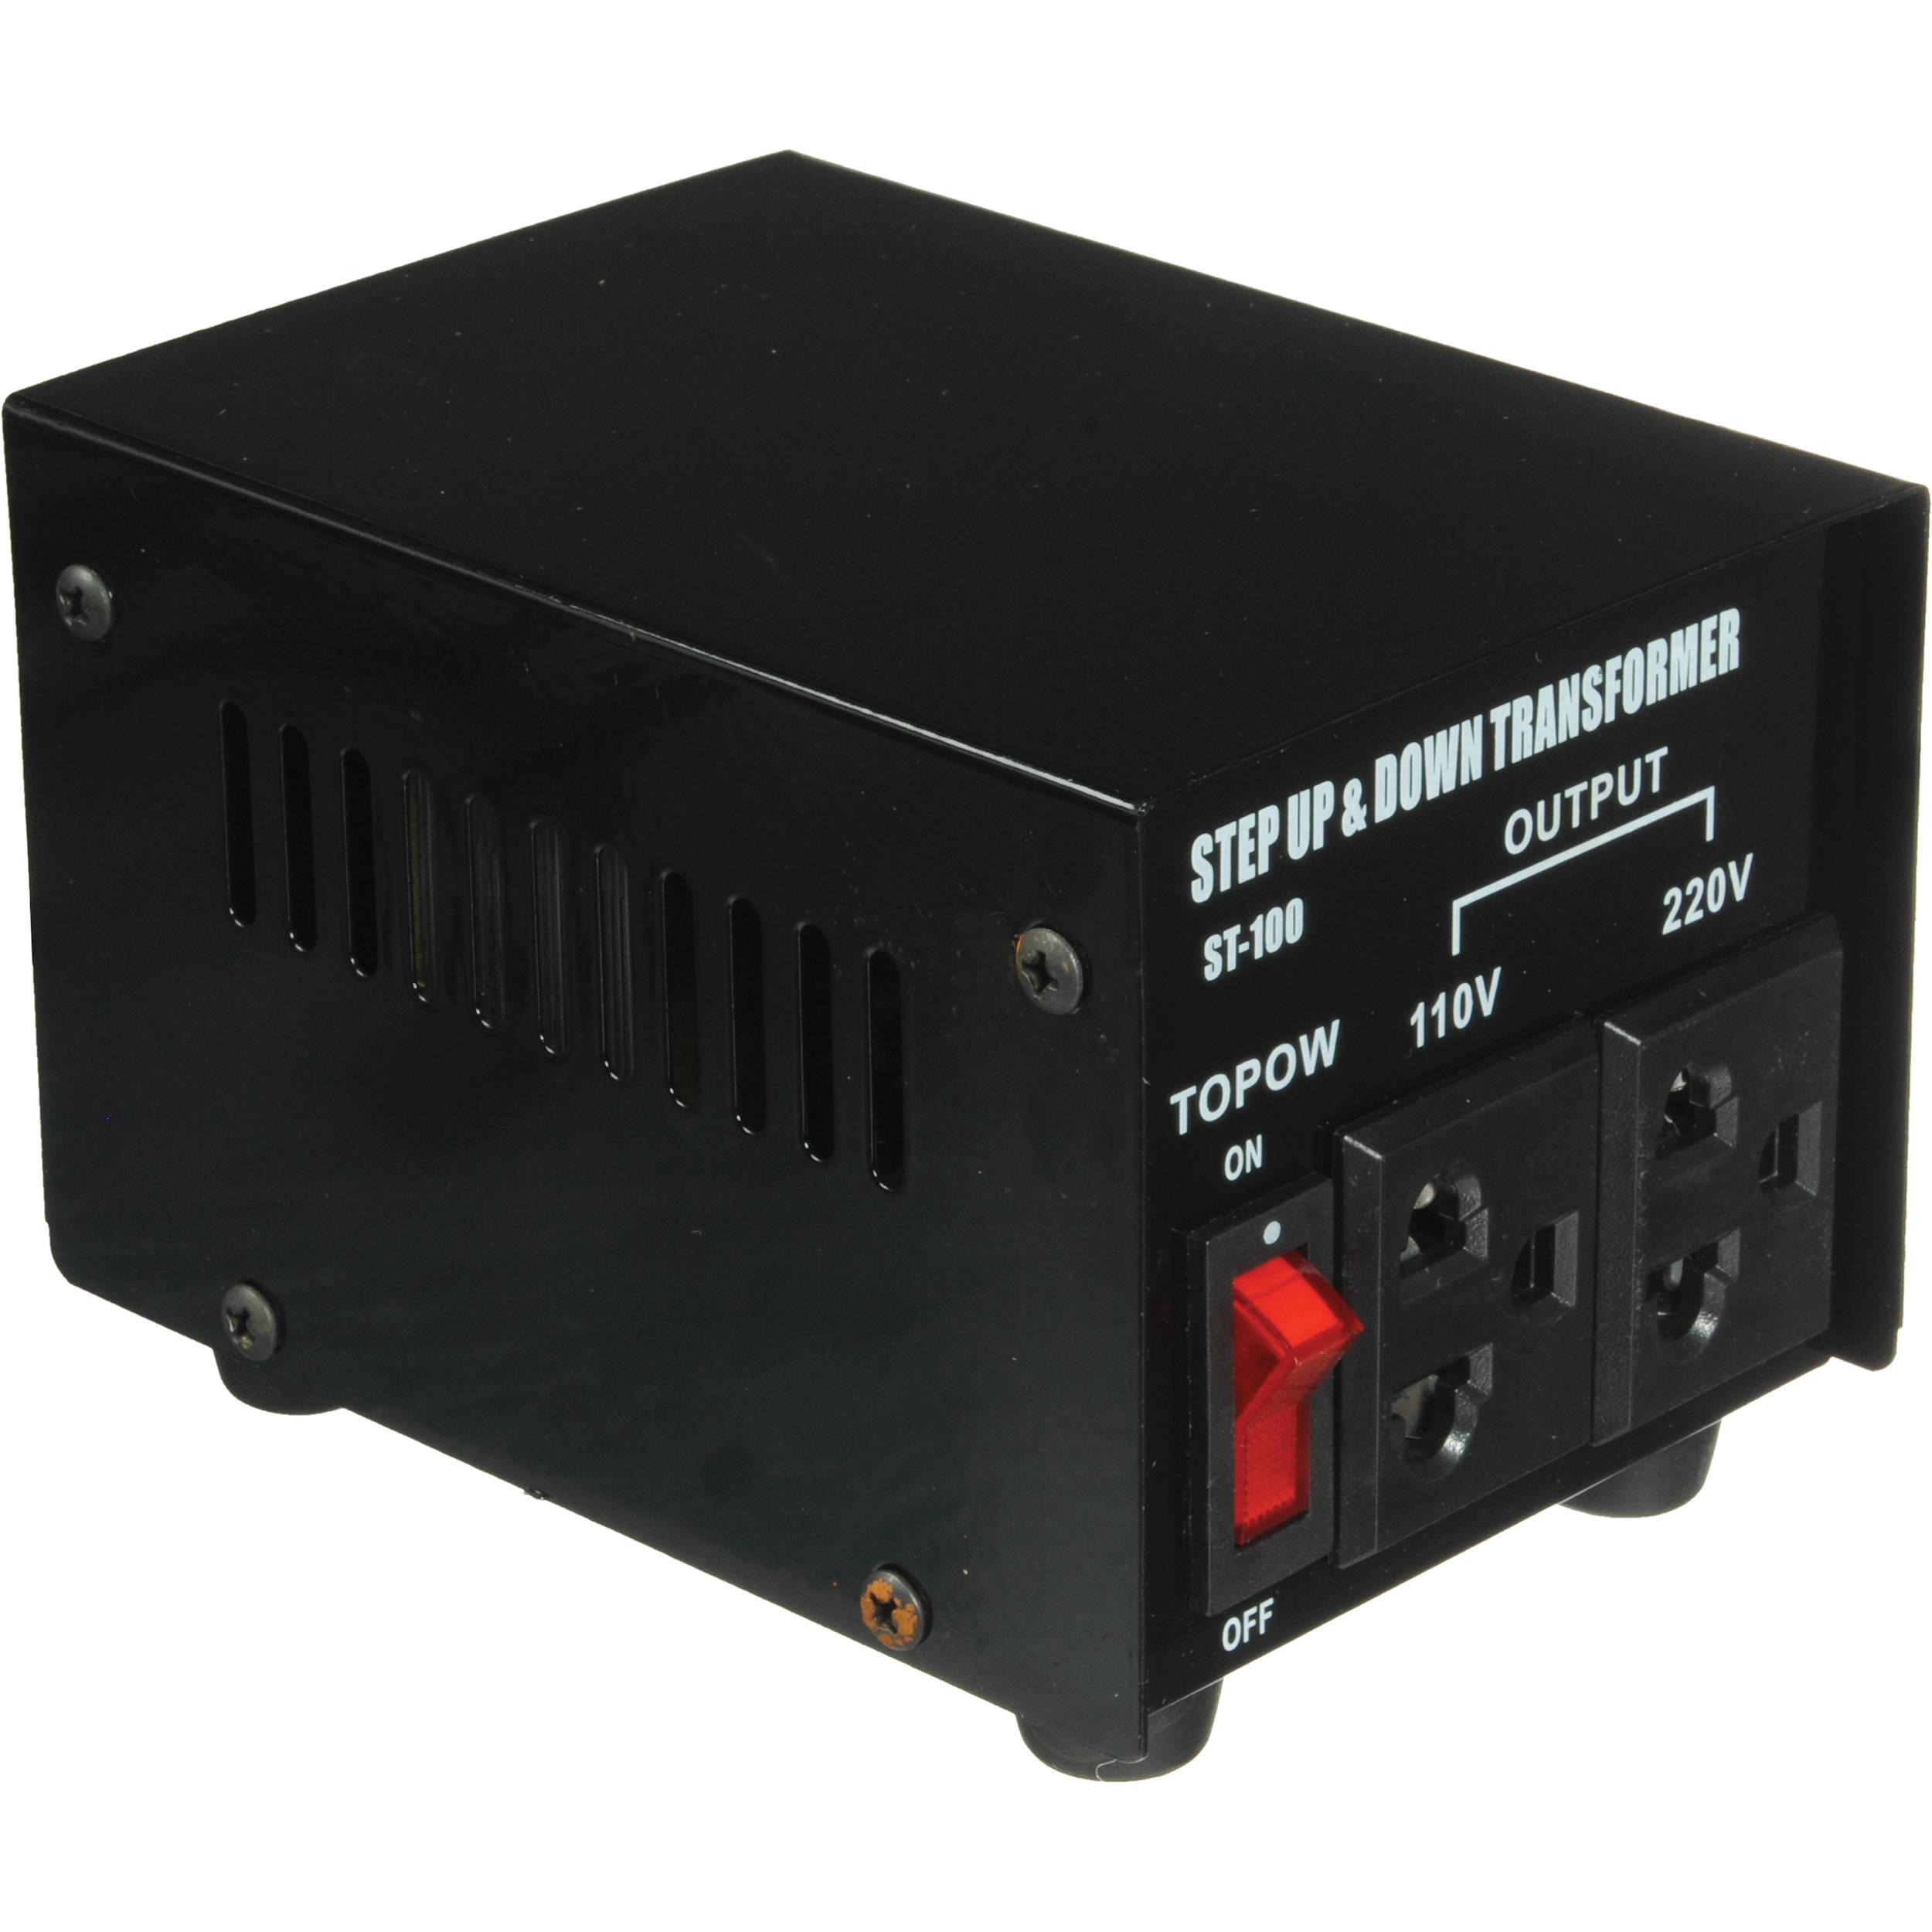 step down transformer diagram 2007 silverado wiring for trailer fuse box with 35